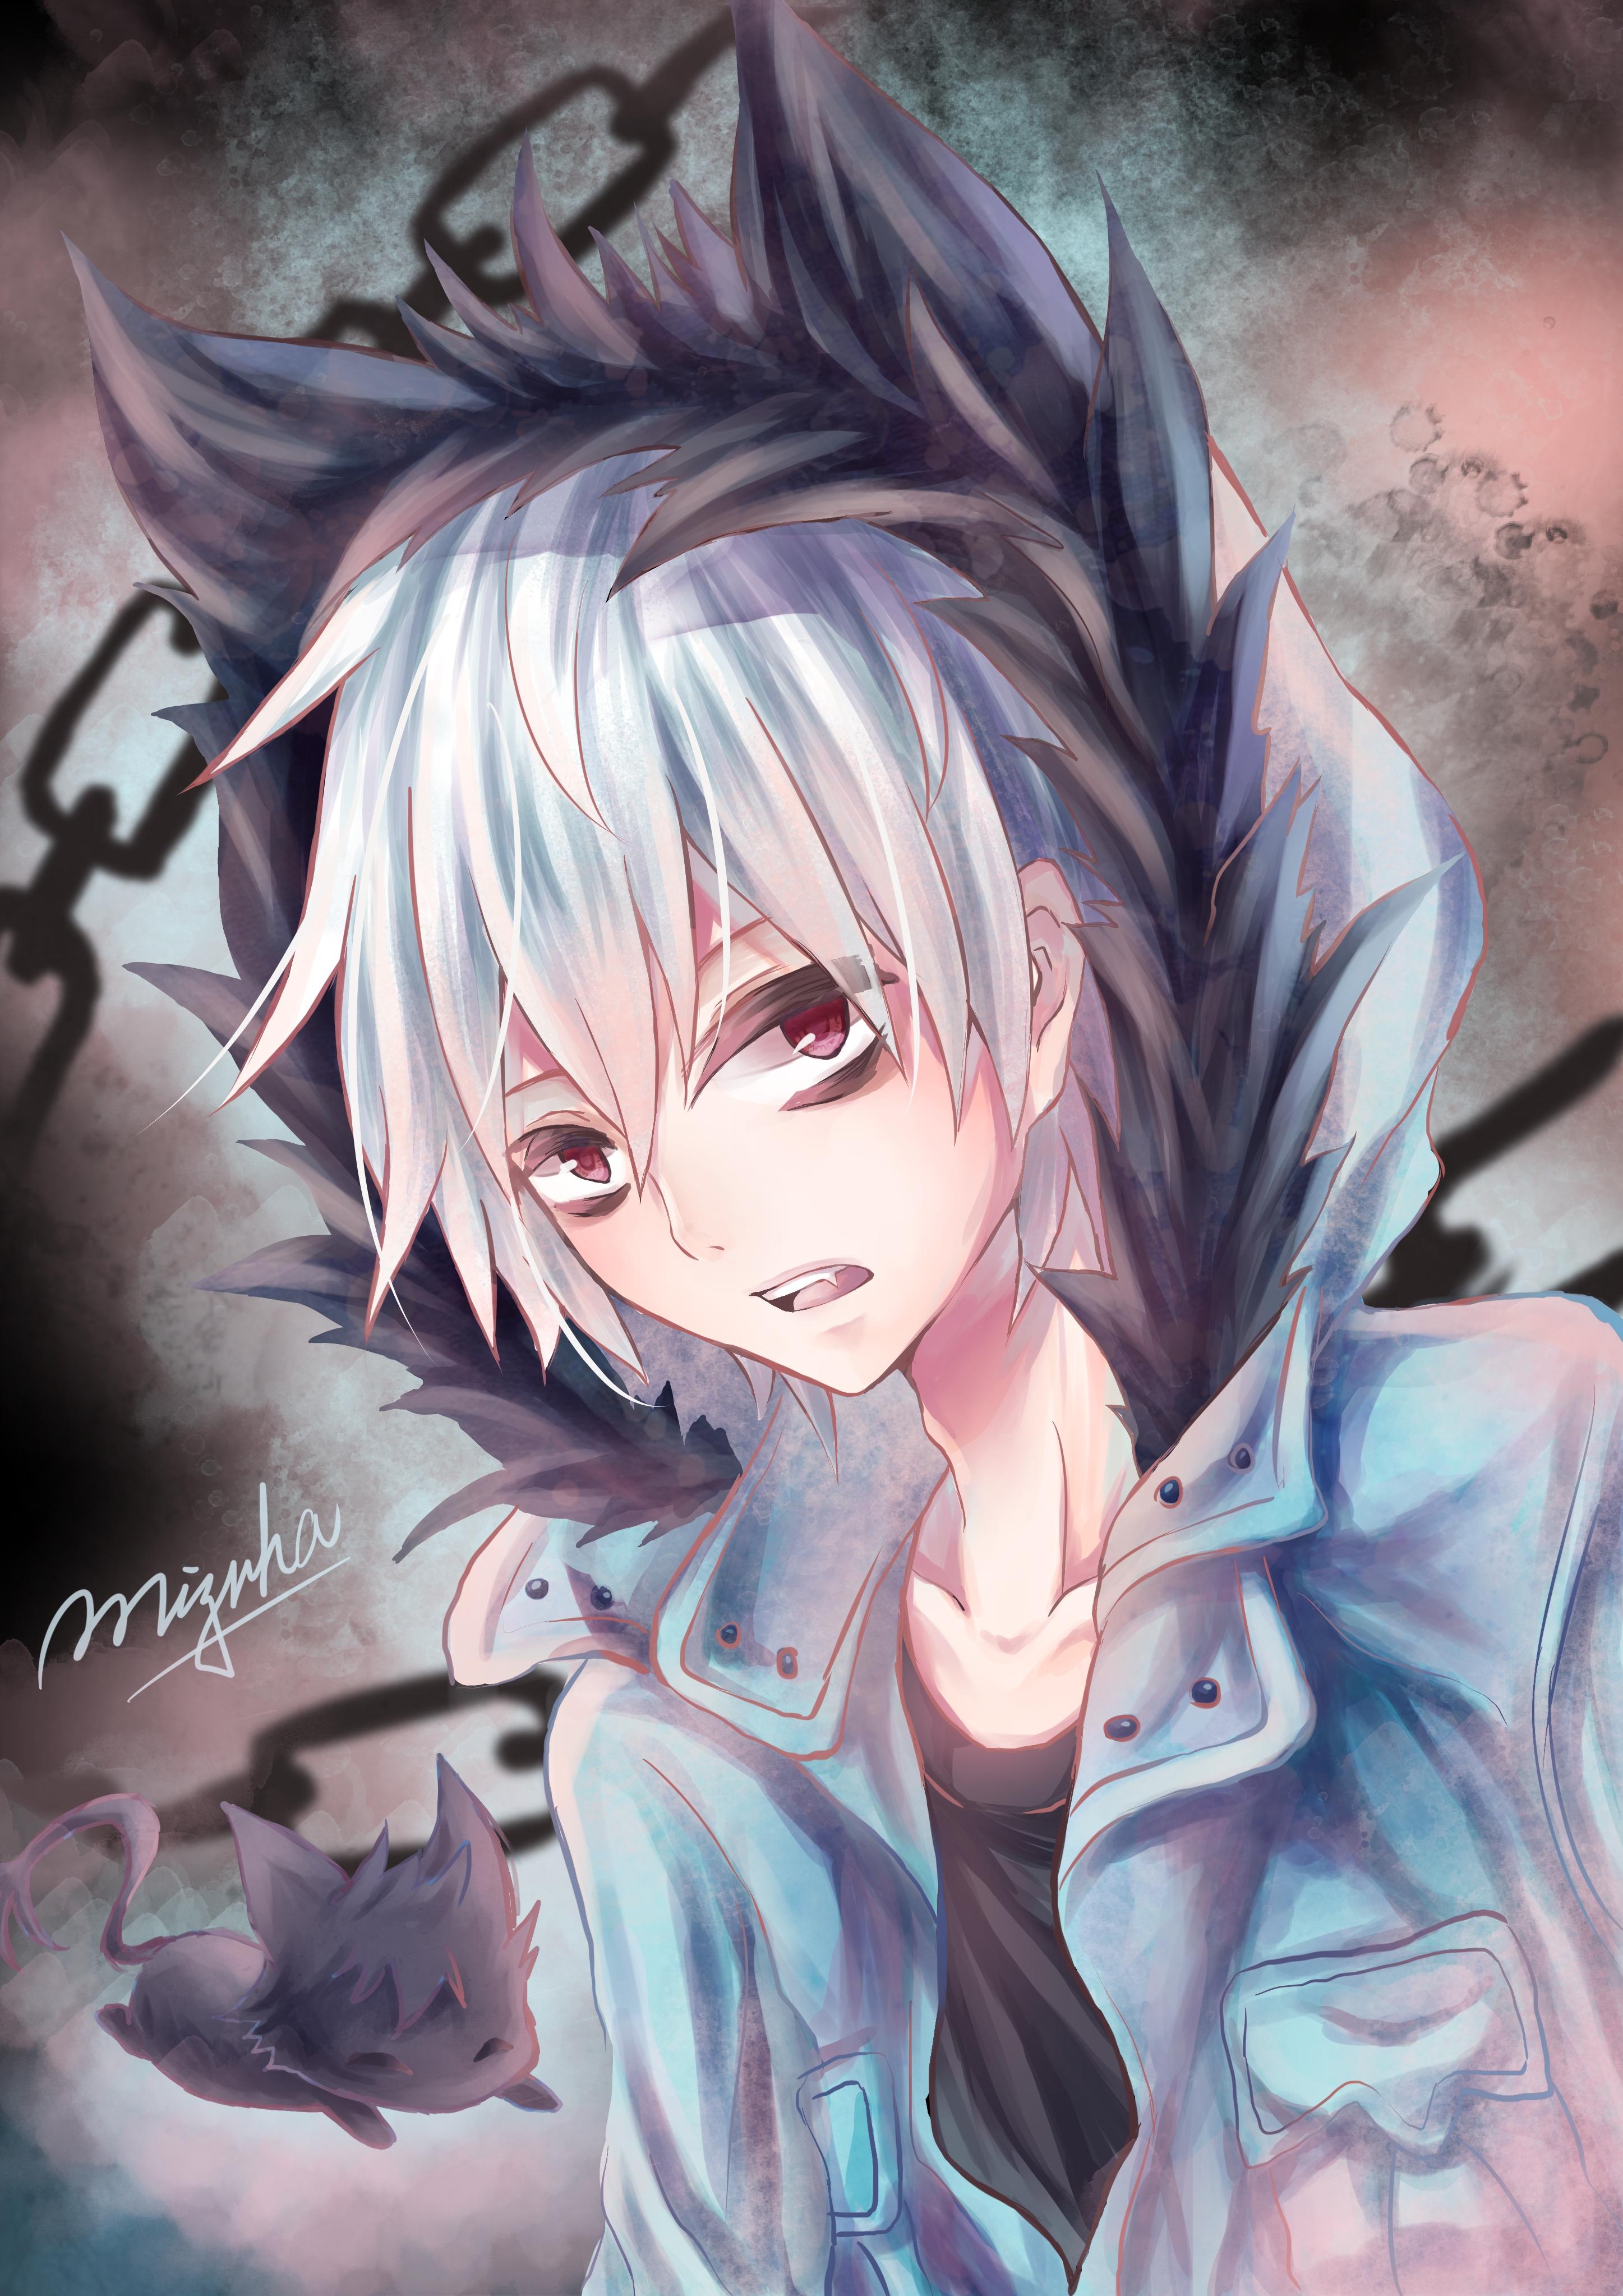 Kuro servamp zerochan anime image board - Fanart anime wallpaper ...